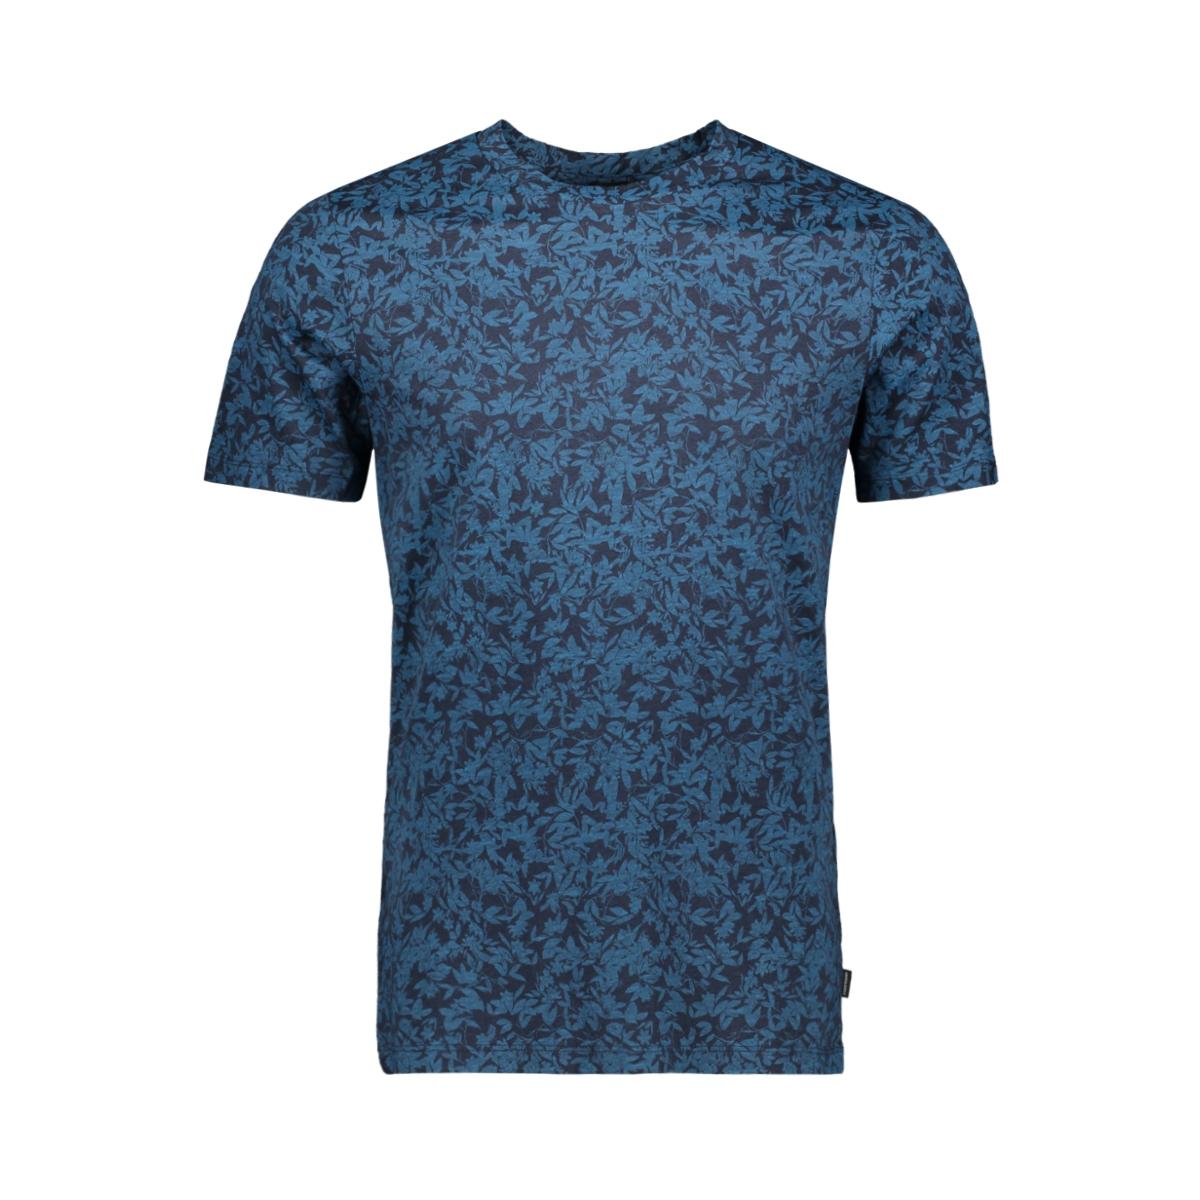 jprflower bla. tee ss crew neck 12158942 jack & jones t-shirt navy blazer/slim fit